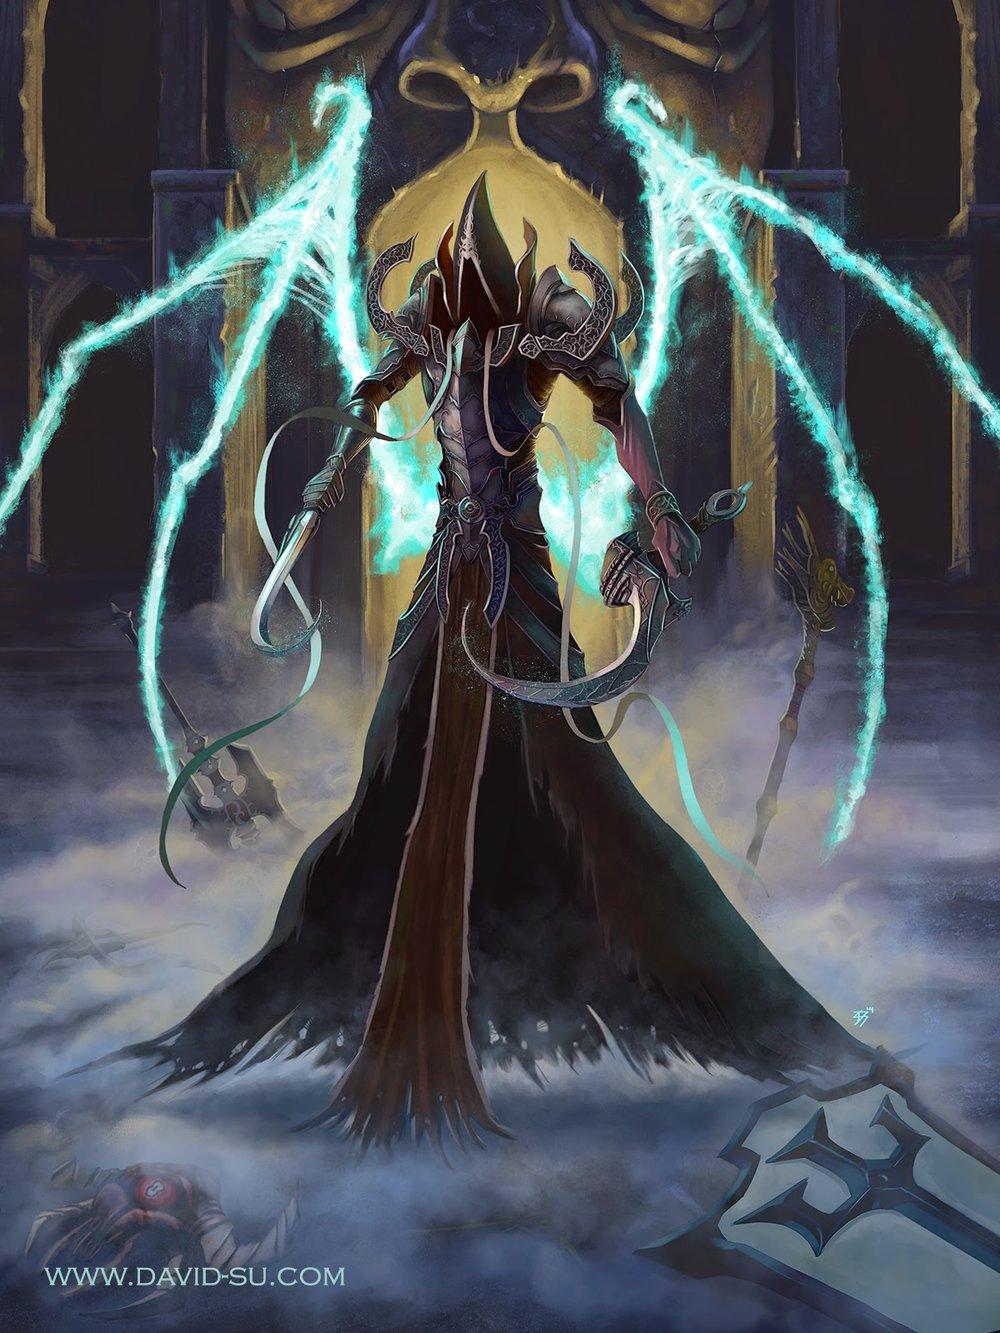 David_Su_Diablo_3_Reaper_of_Souls_Deviant_Art_Contest_Final_Web.jpg